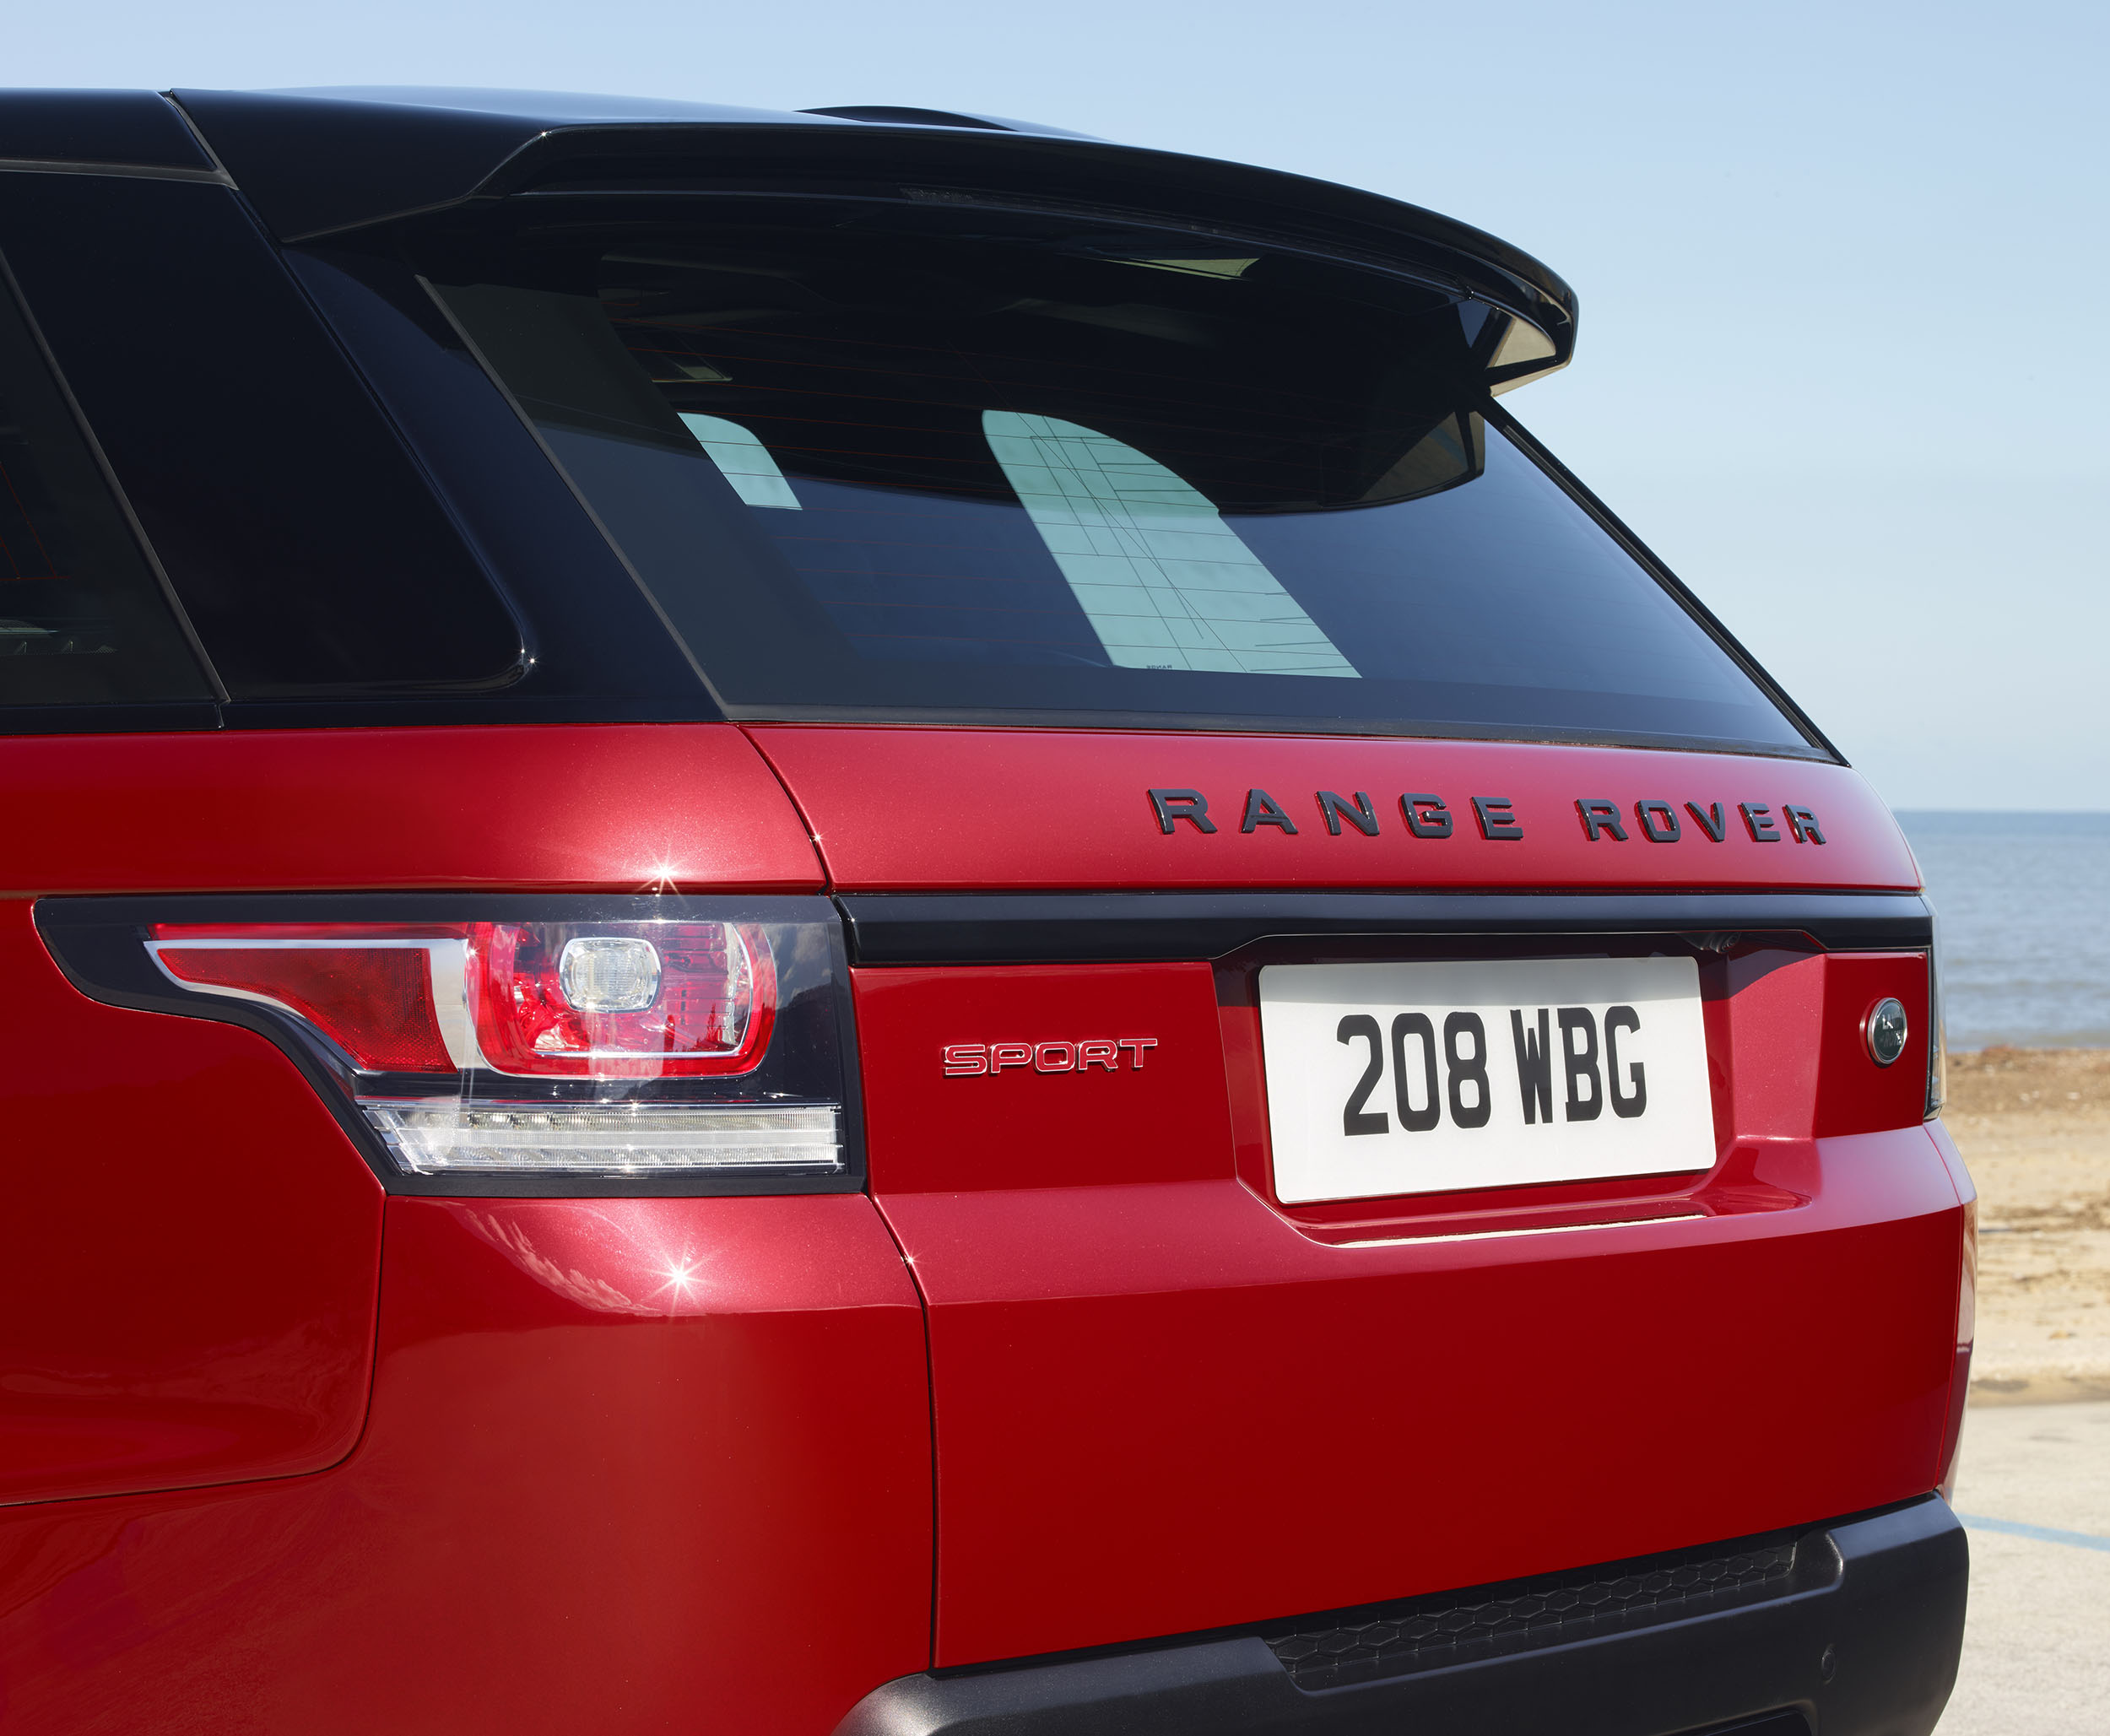 2016 Range Rover Sport HST - HD Pictures @ carsinvasion.com